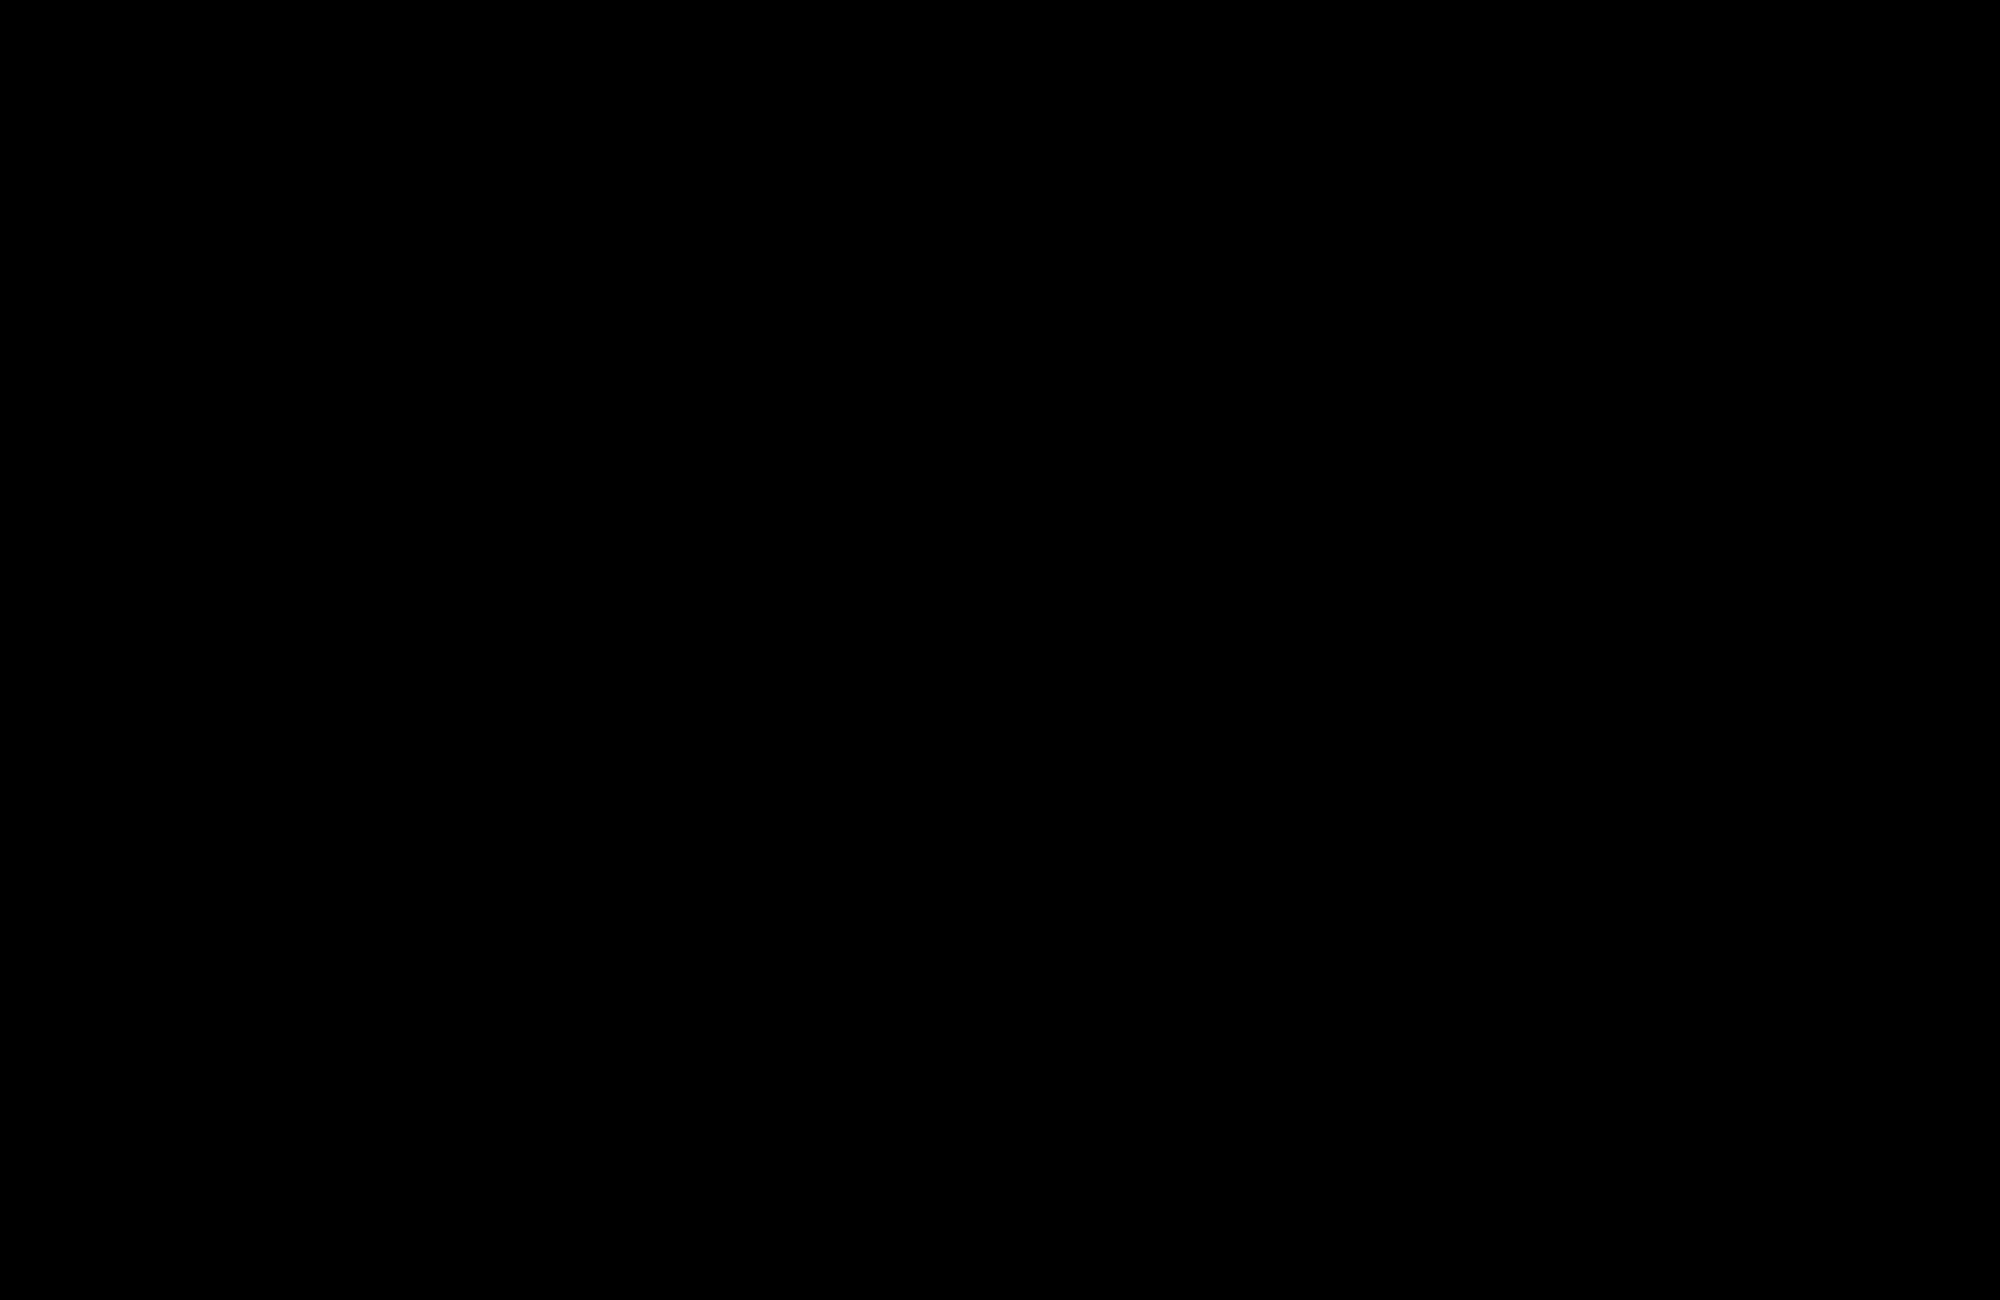 EXM6N Neodymium Series Midrange Frequency Response